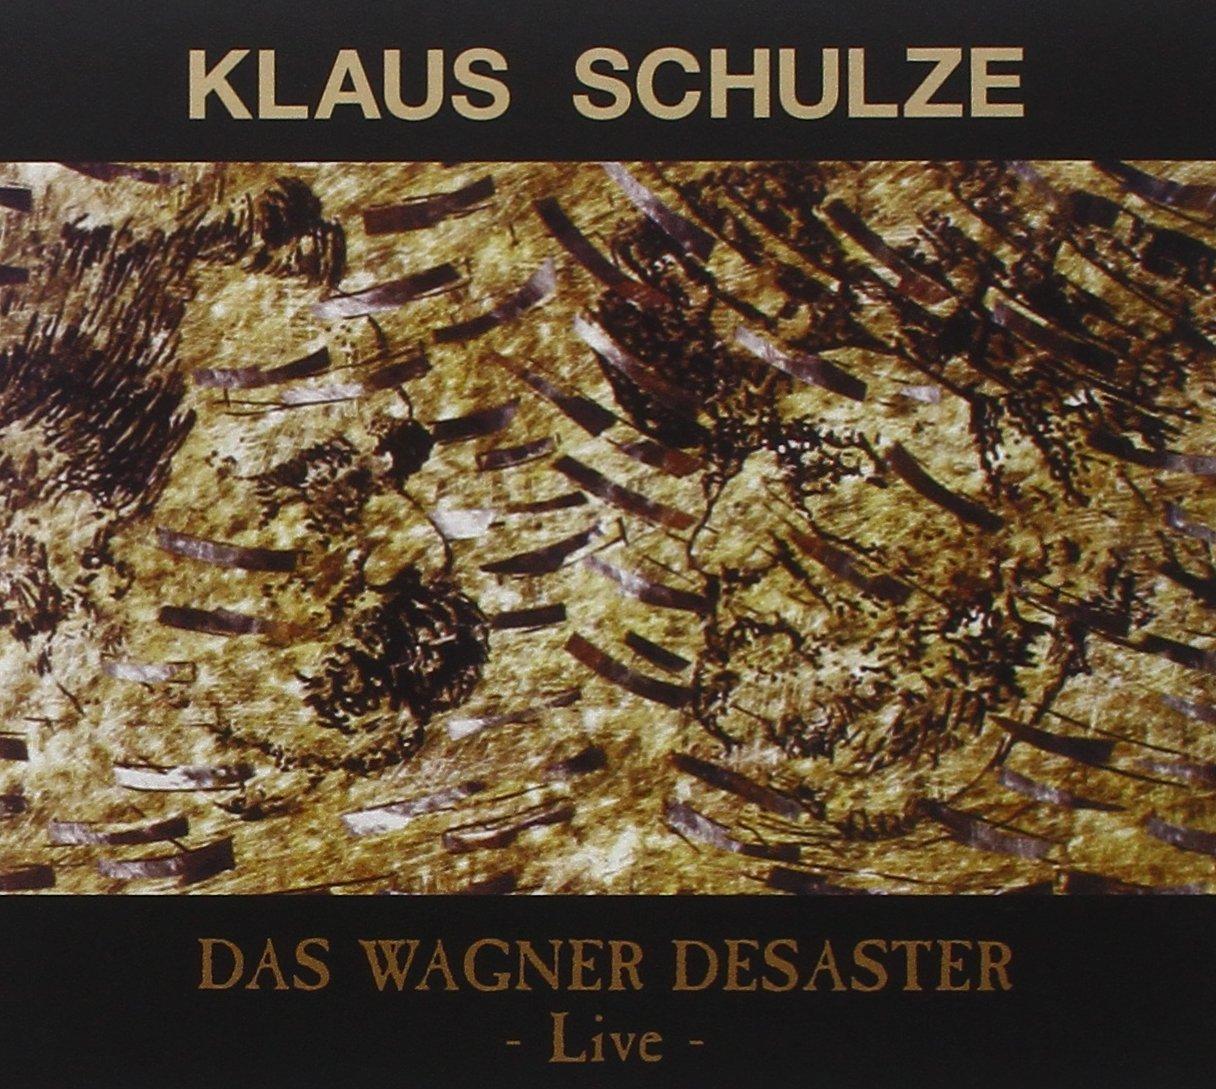 Das Wagner Desaster Live